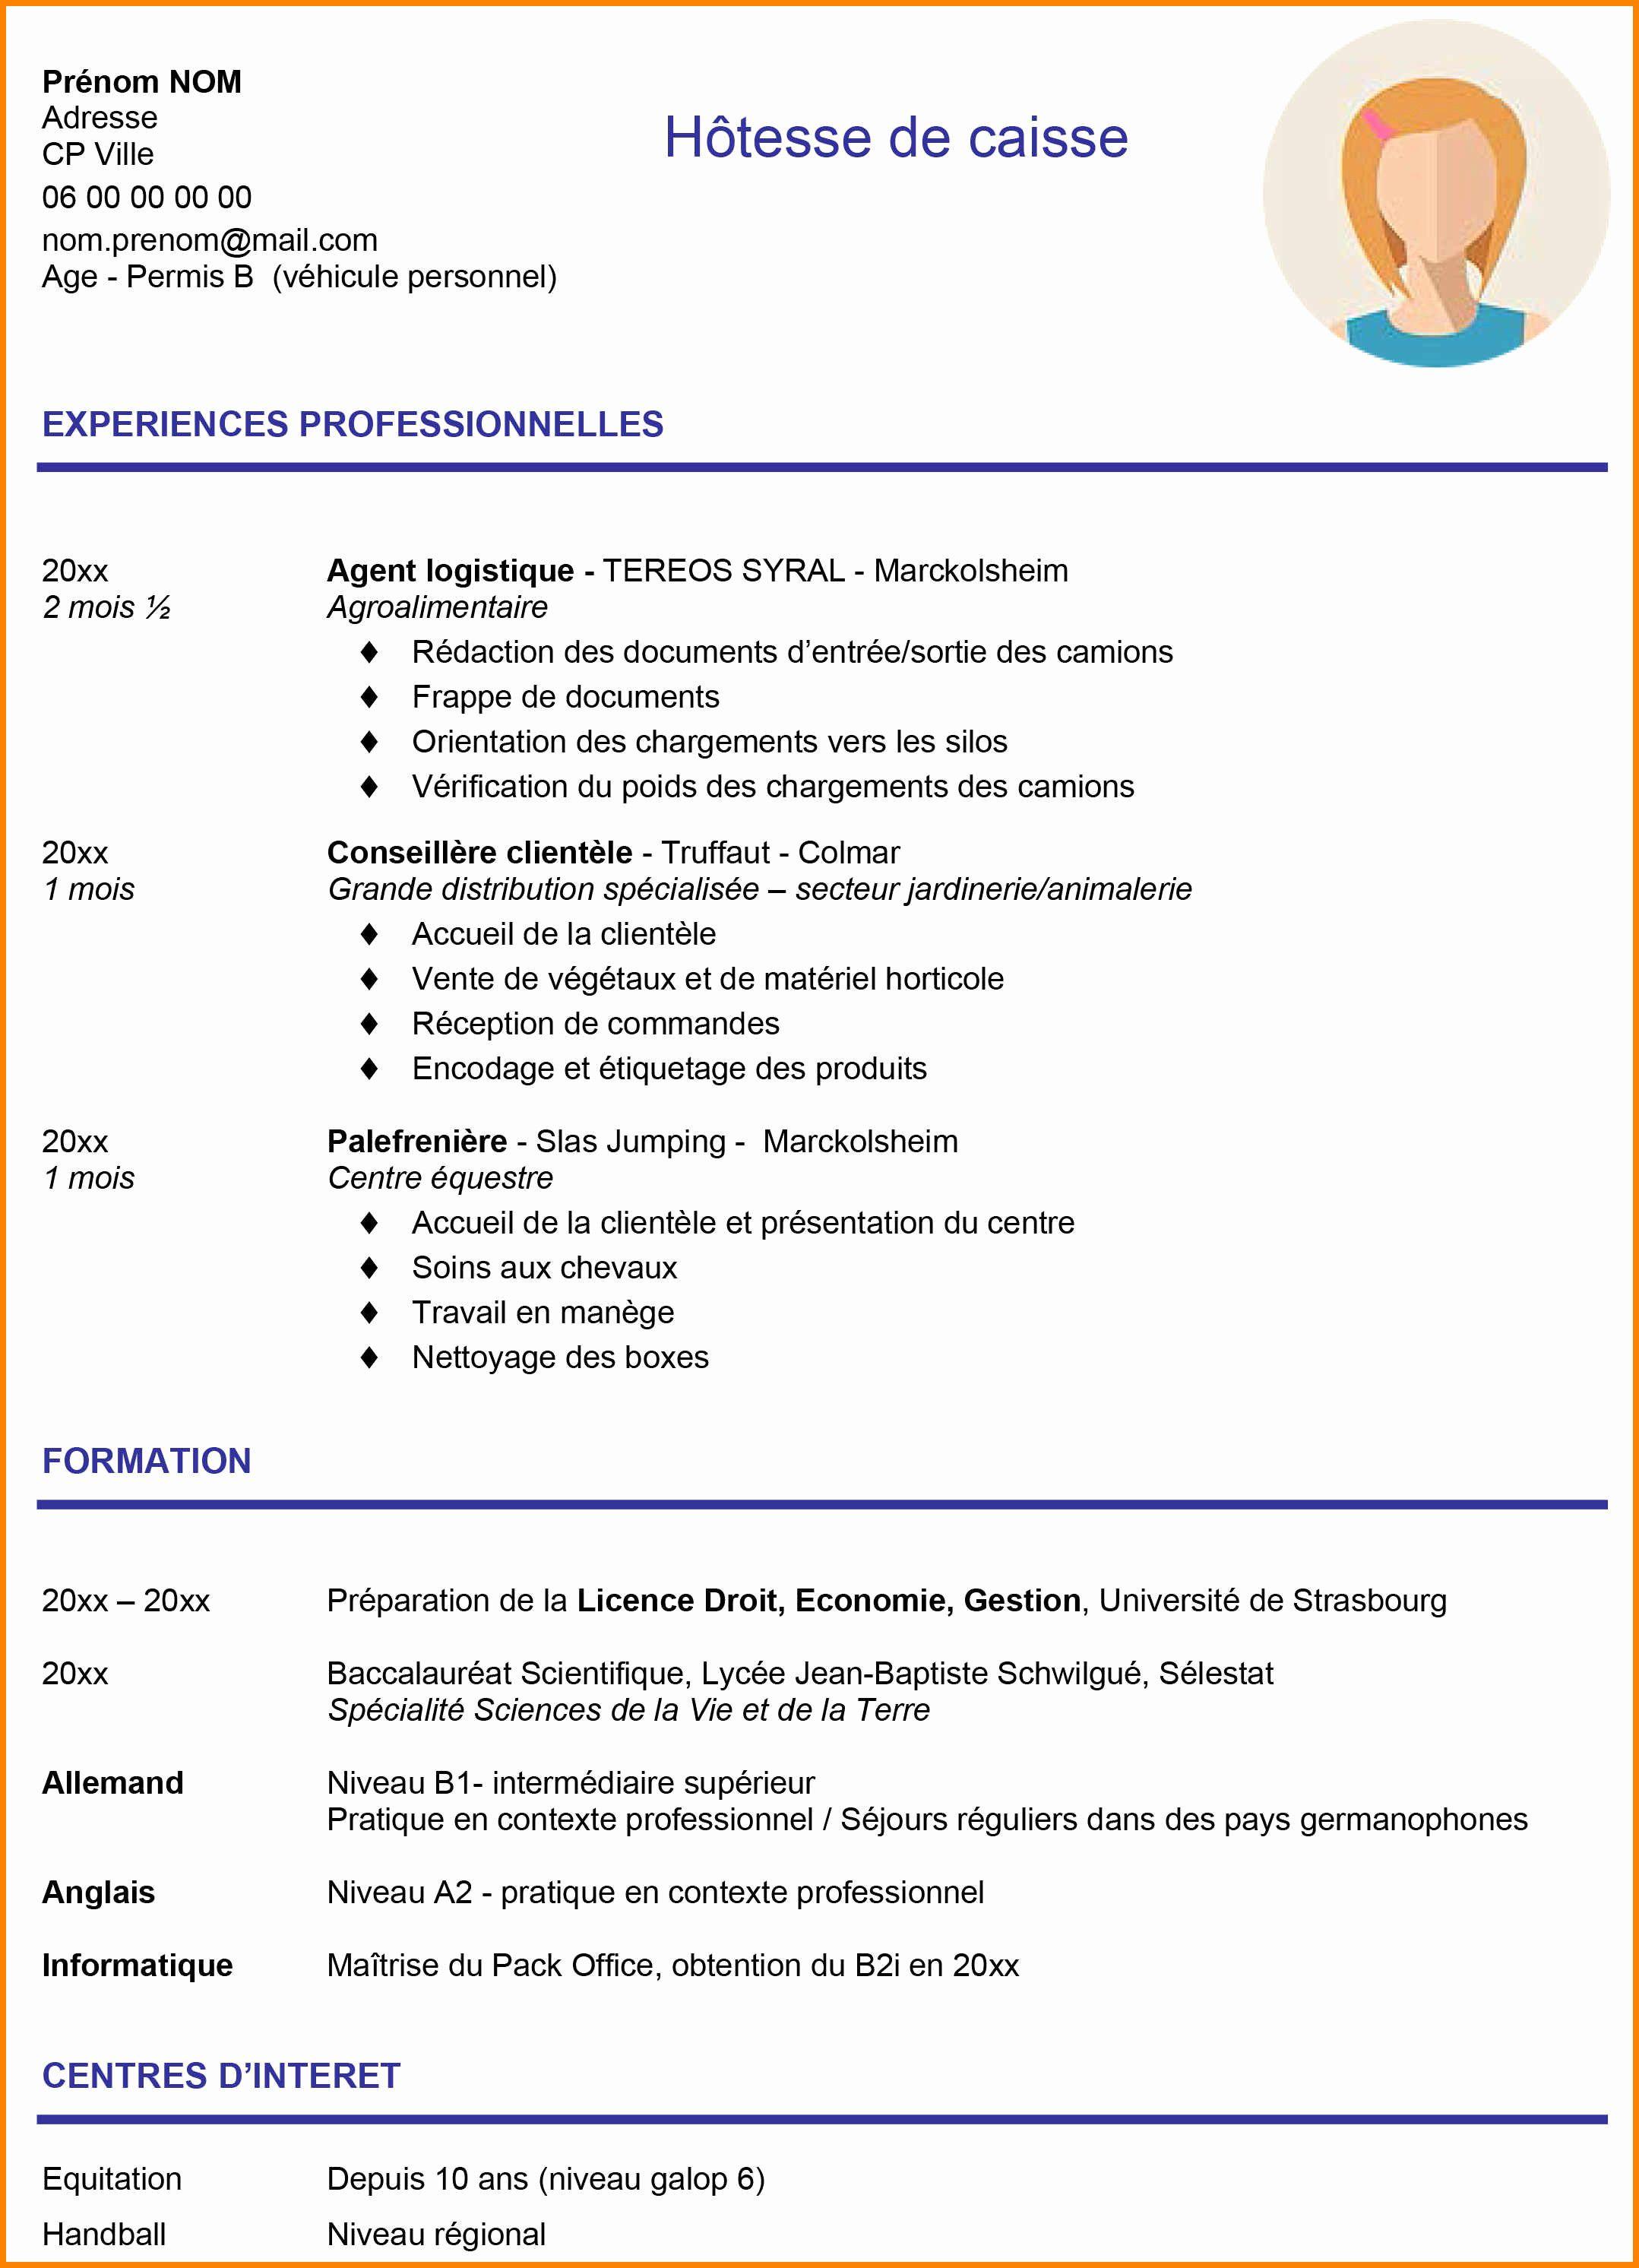 Luxury Modele Inventaire Location Meublee Excel Un Jobs Job